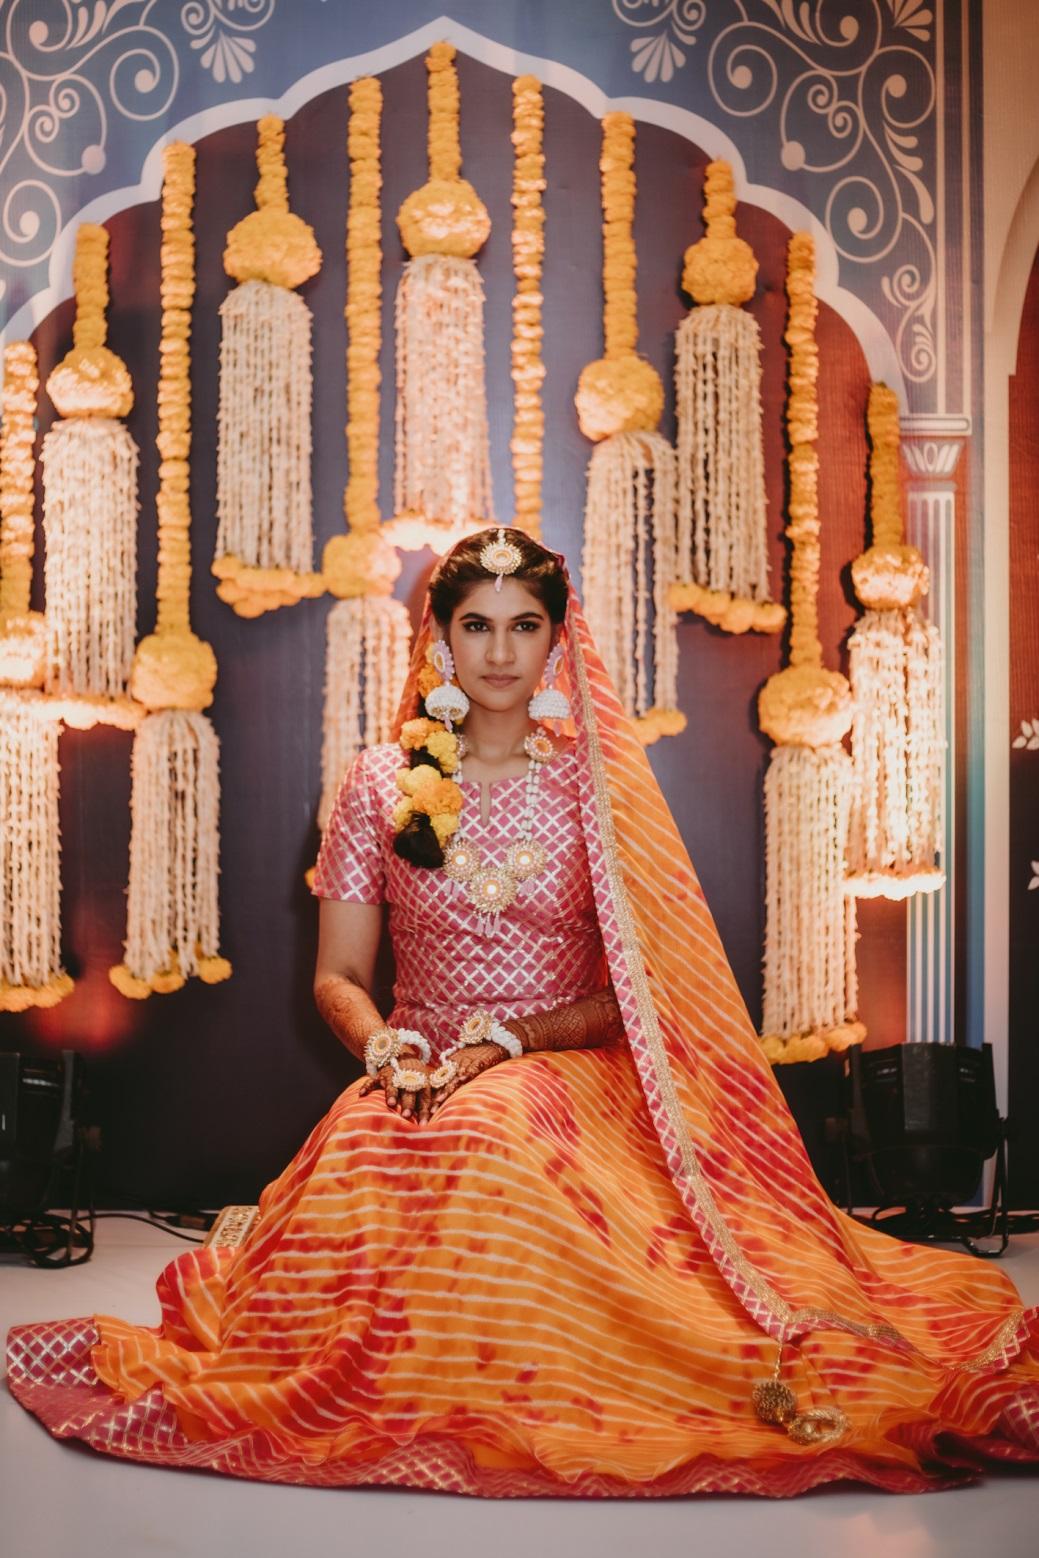 Muslim bride haldi outfit